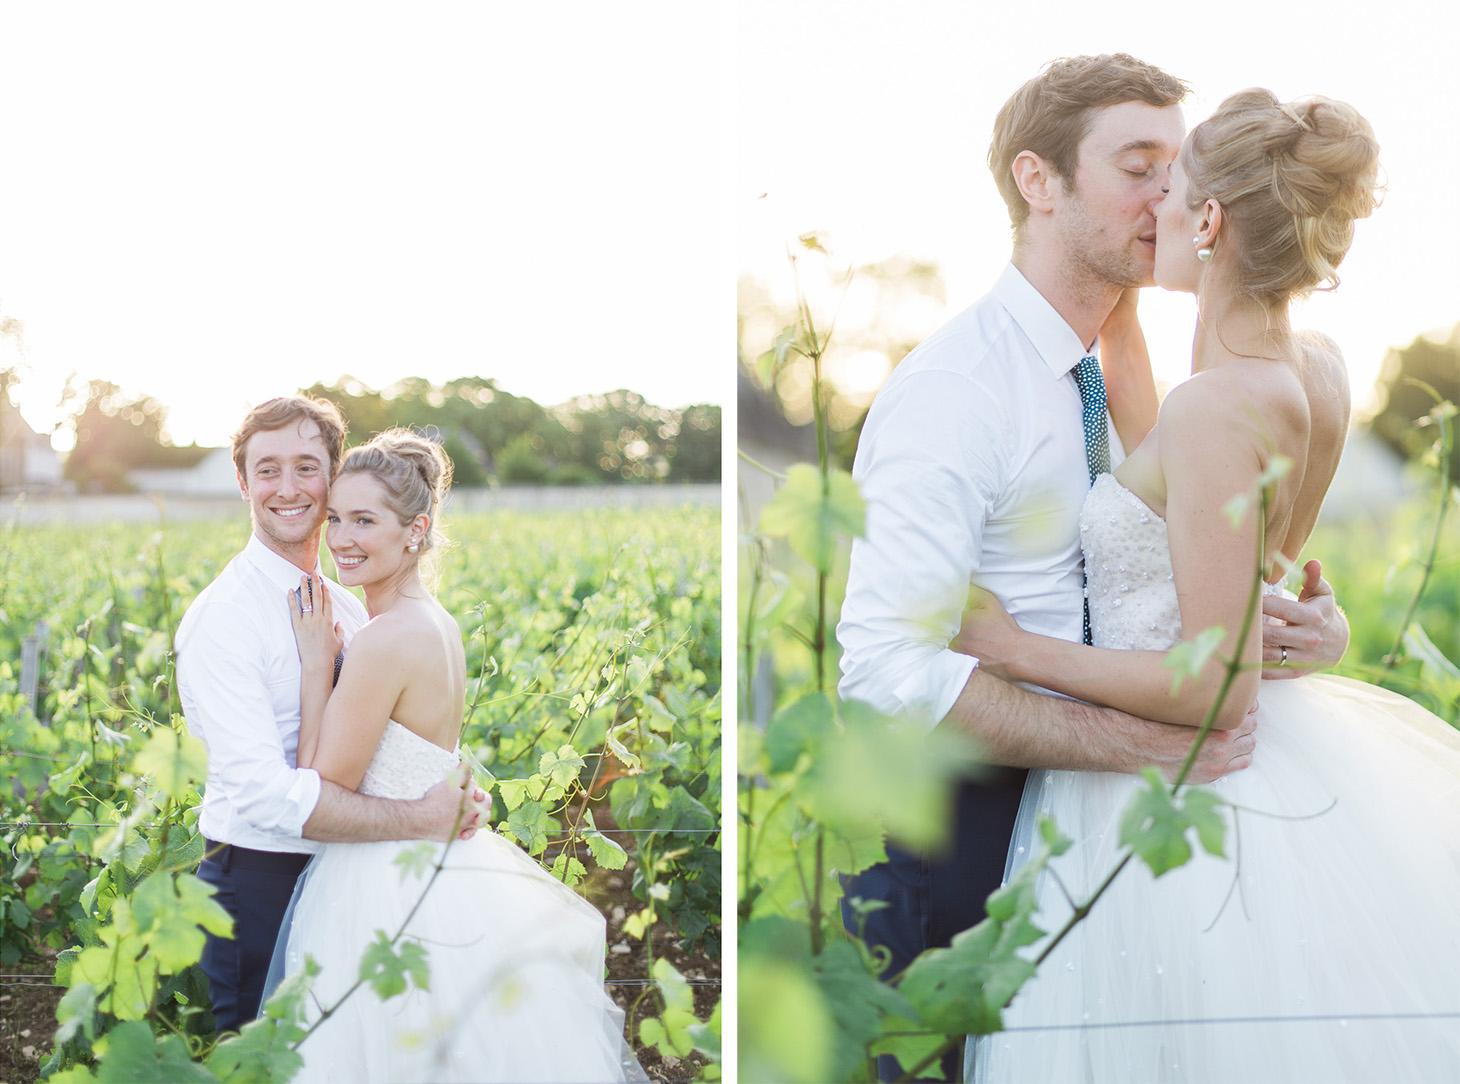 bourgogne_wedding_photographer_chateau_pommard-105 copie